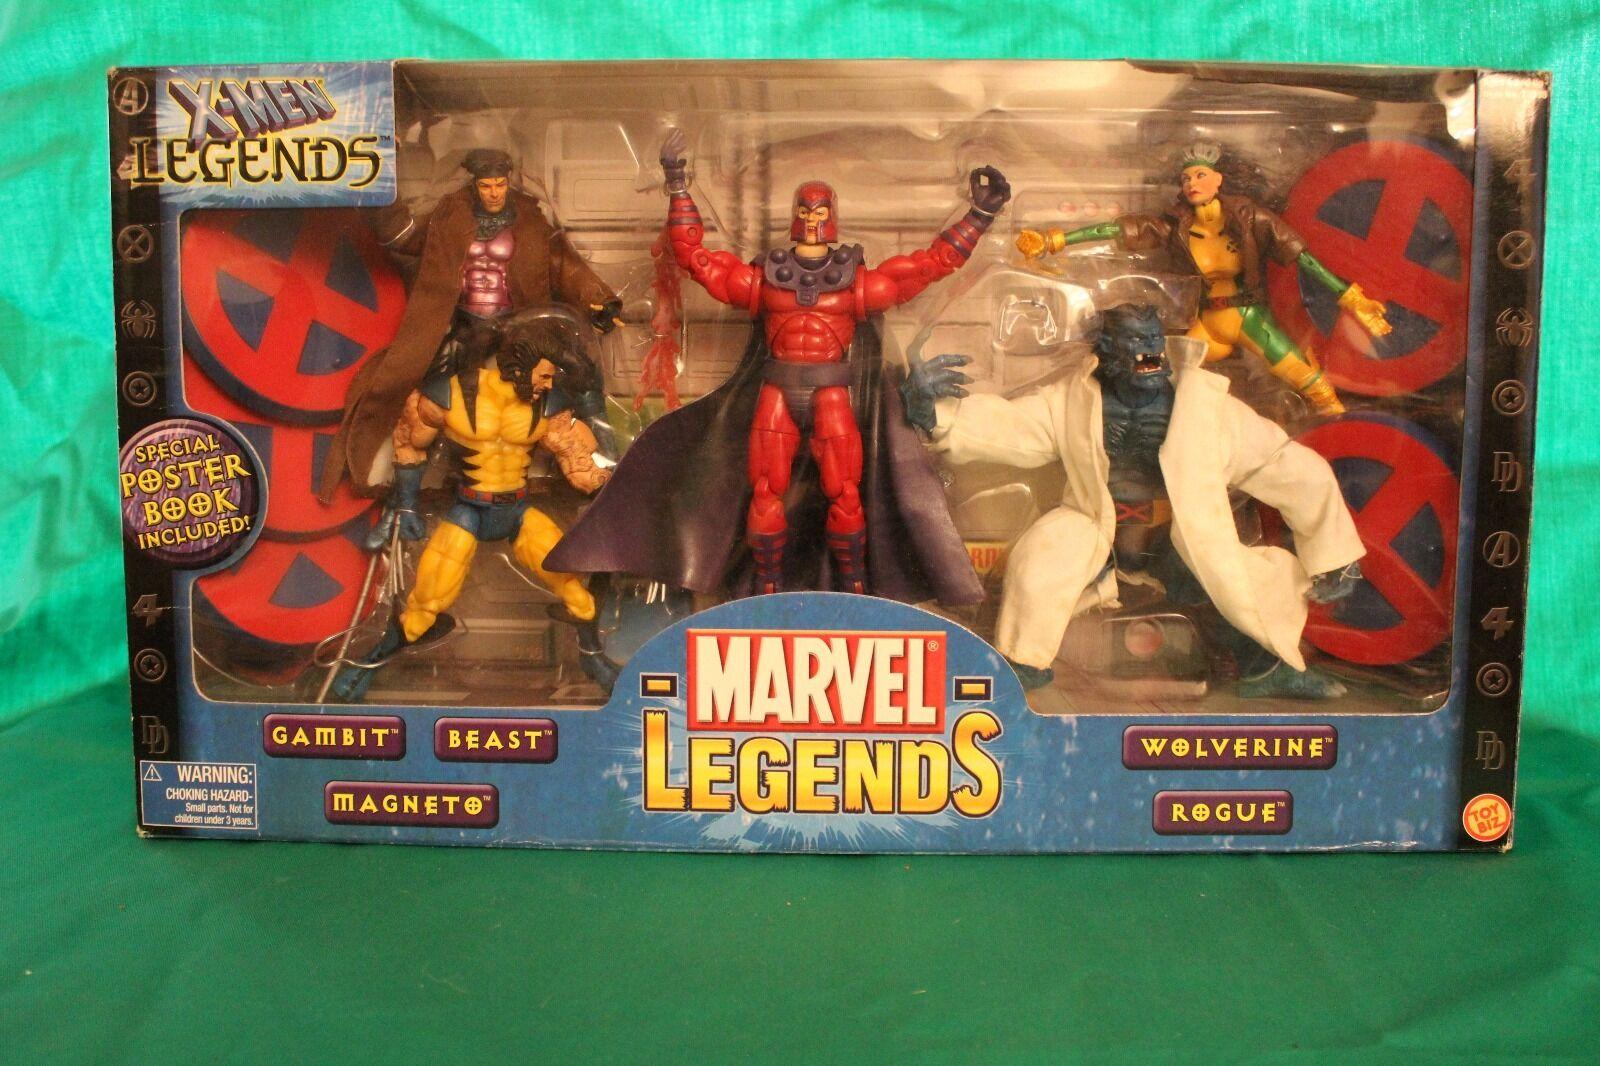 Marvel legends X-Men Legends Box Set (2003)